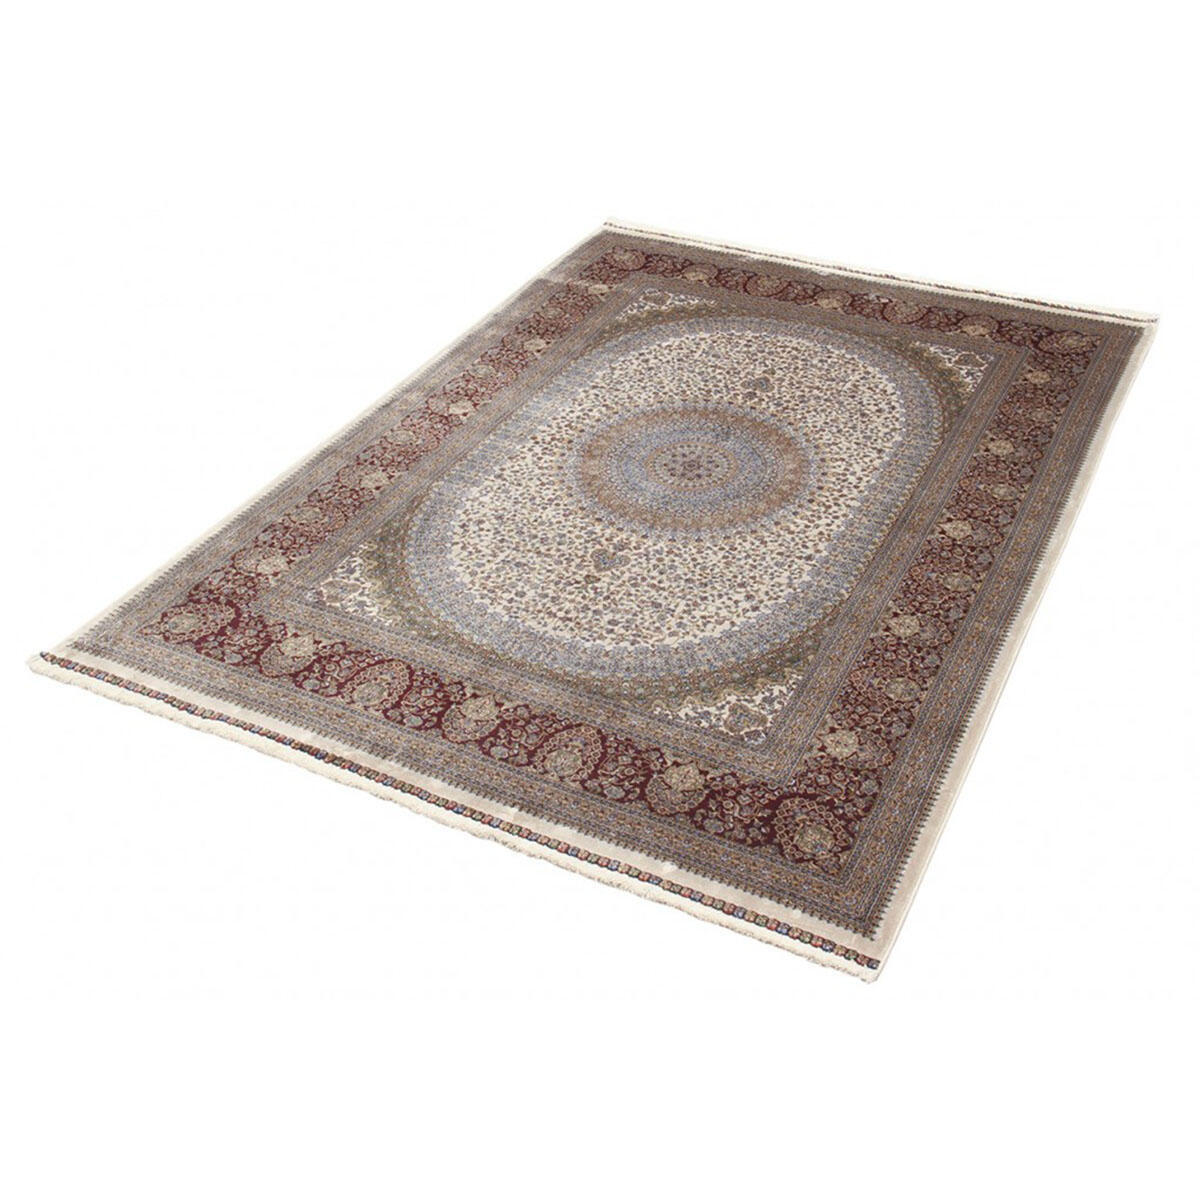 Tappeto Qoum Shah 5 in cotone, beige, 200x290 - 5